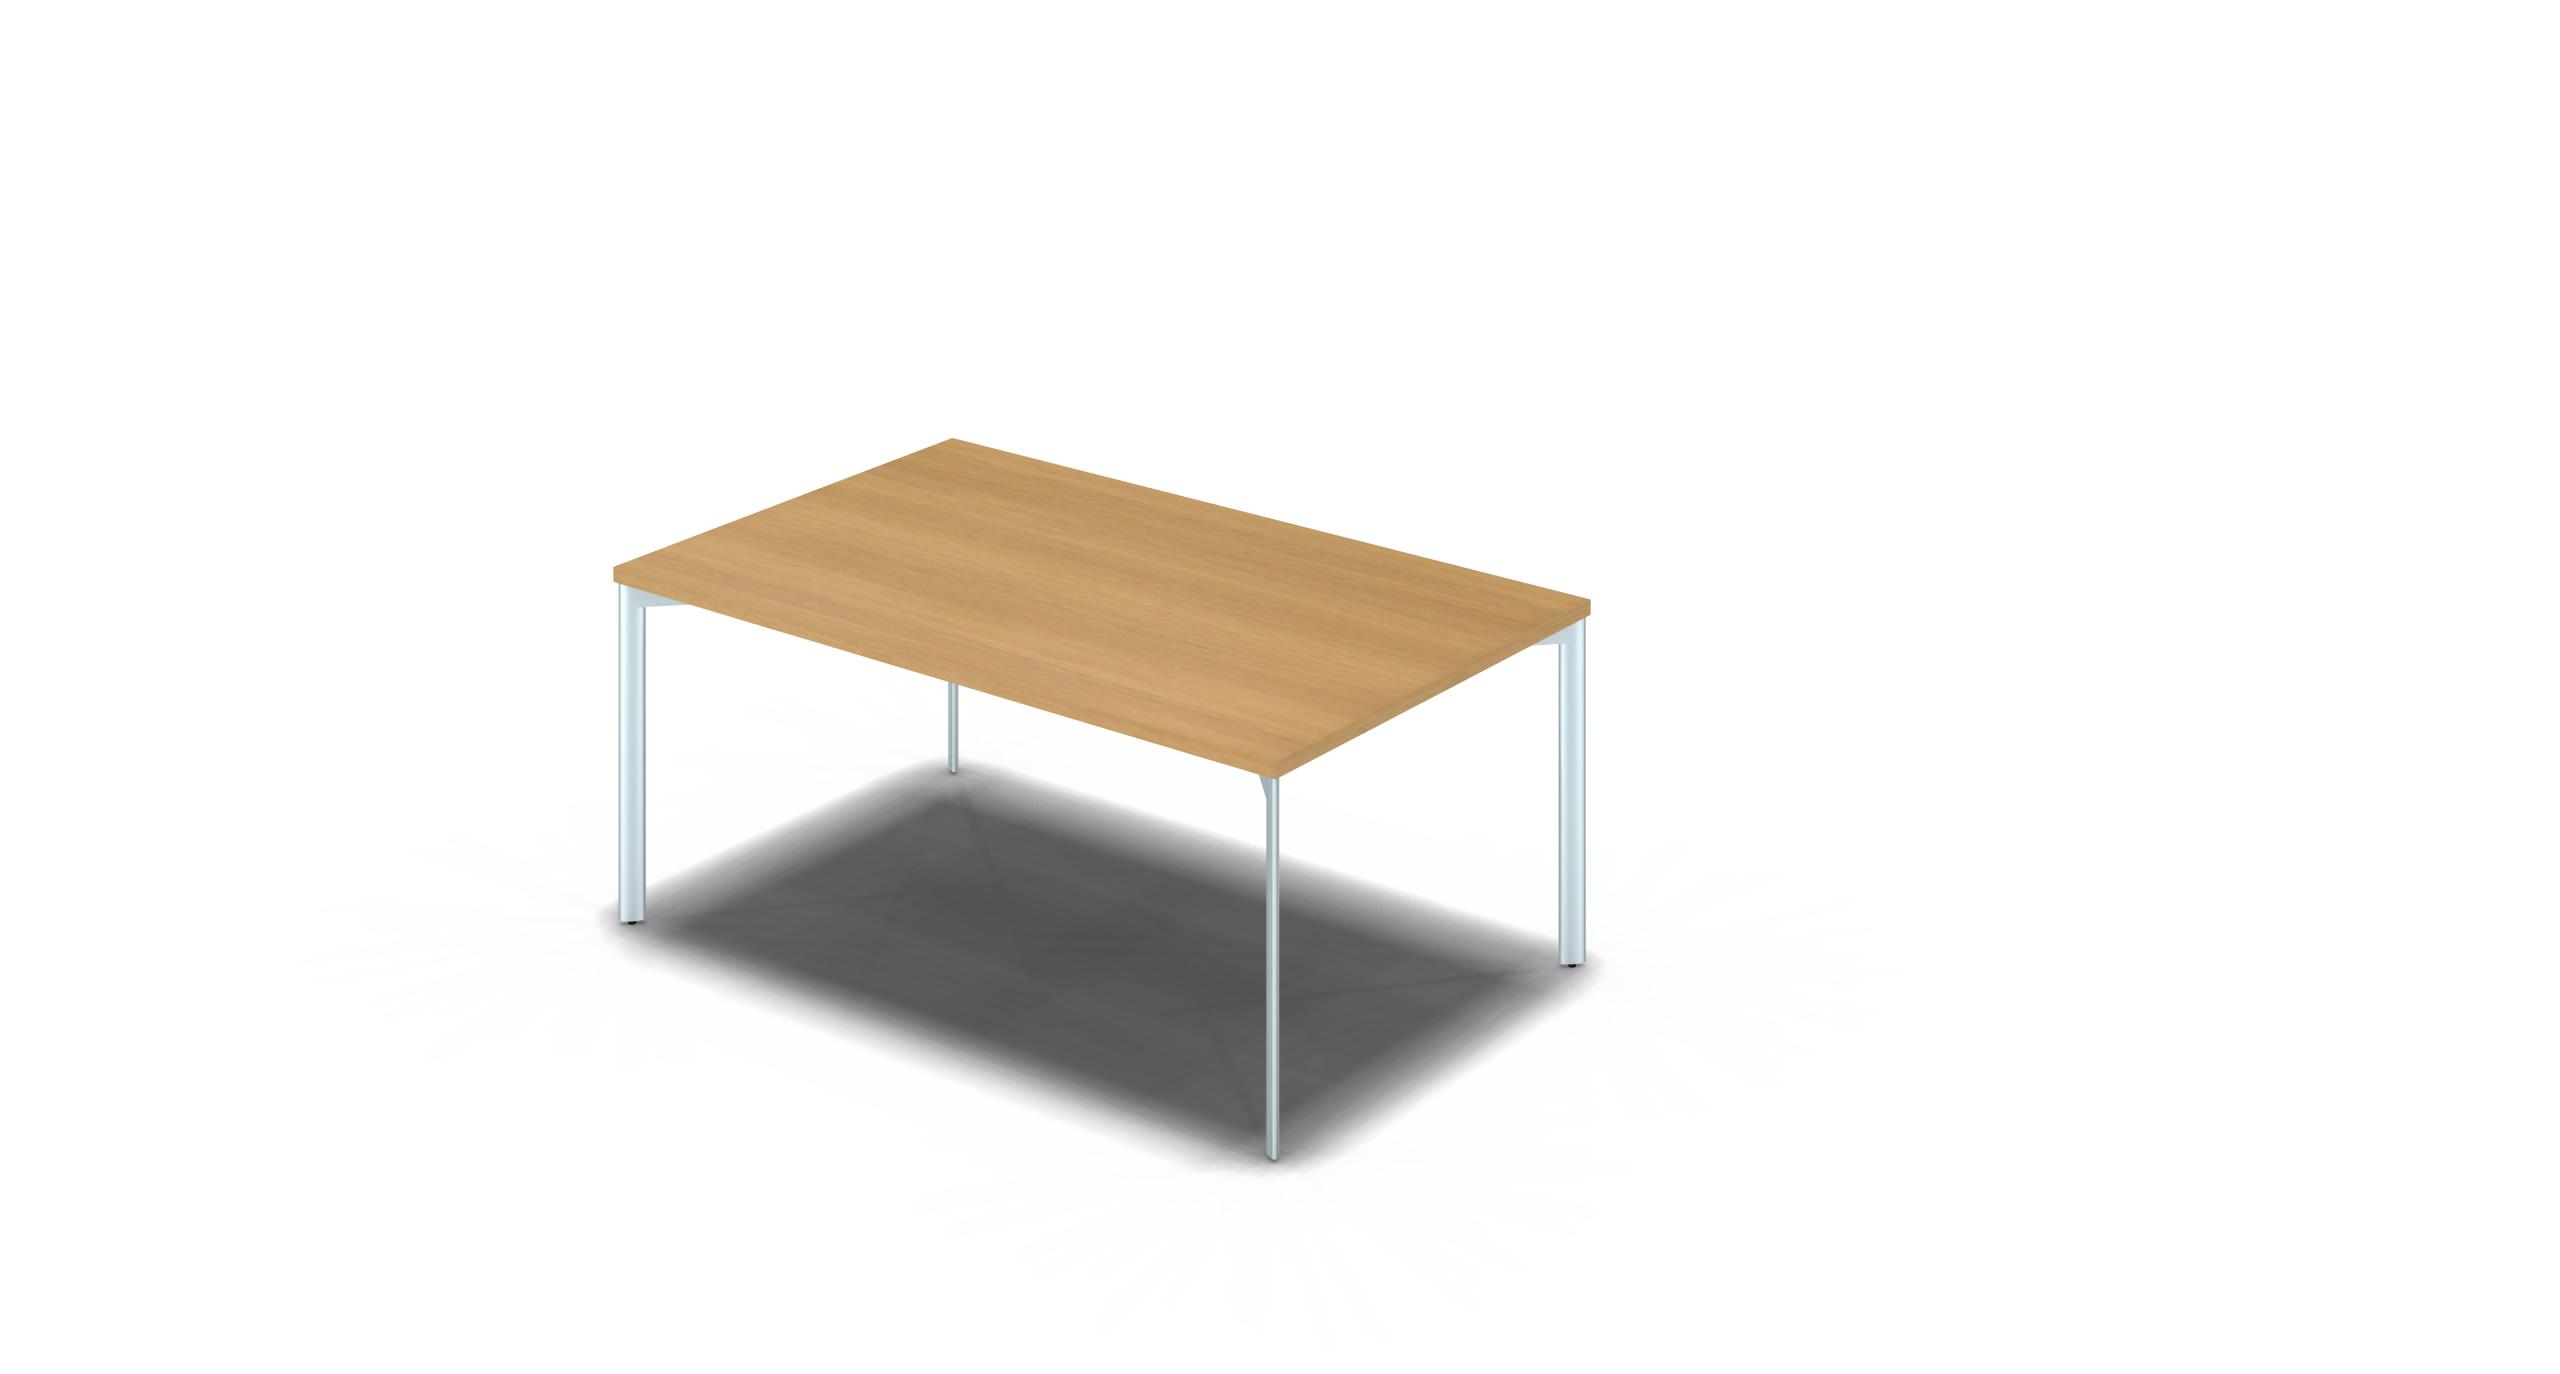 Table_Slim_1500x900_Silver_Oak_noOption